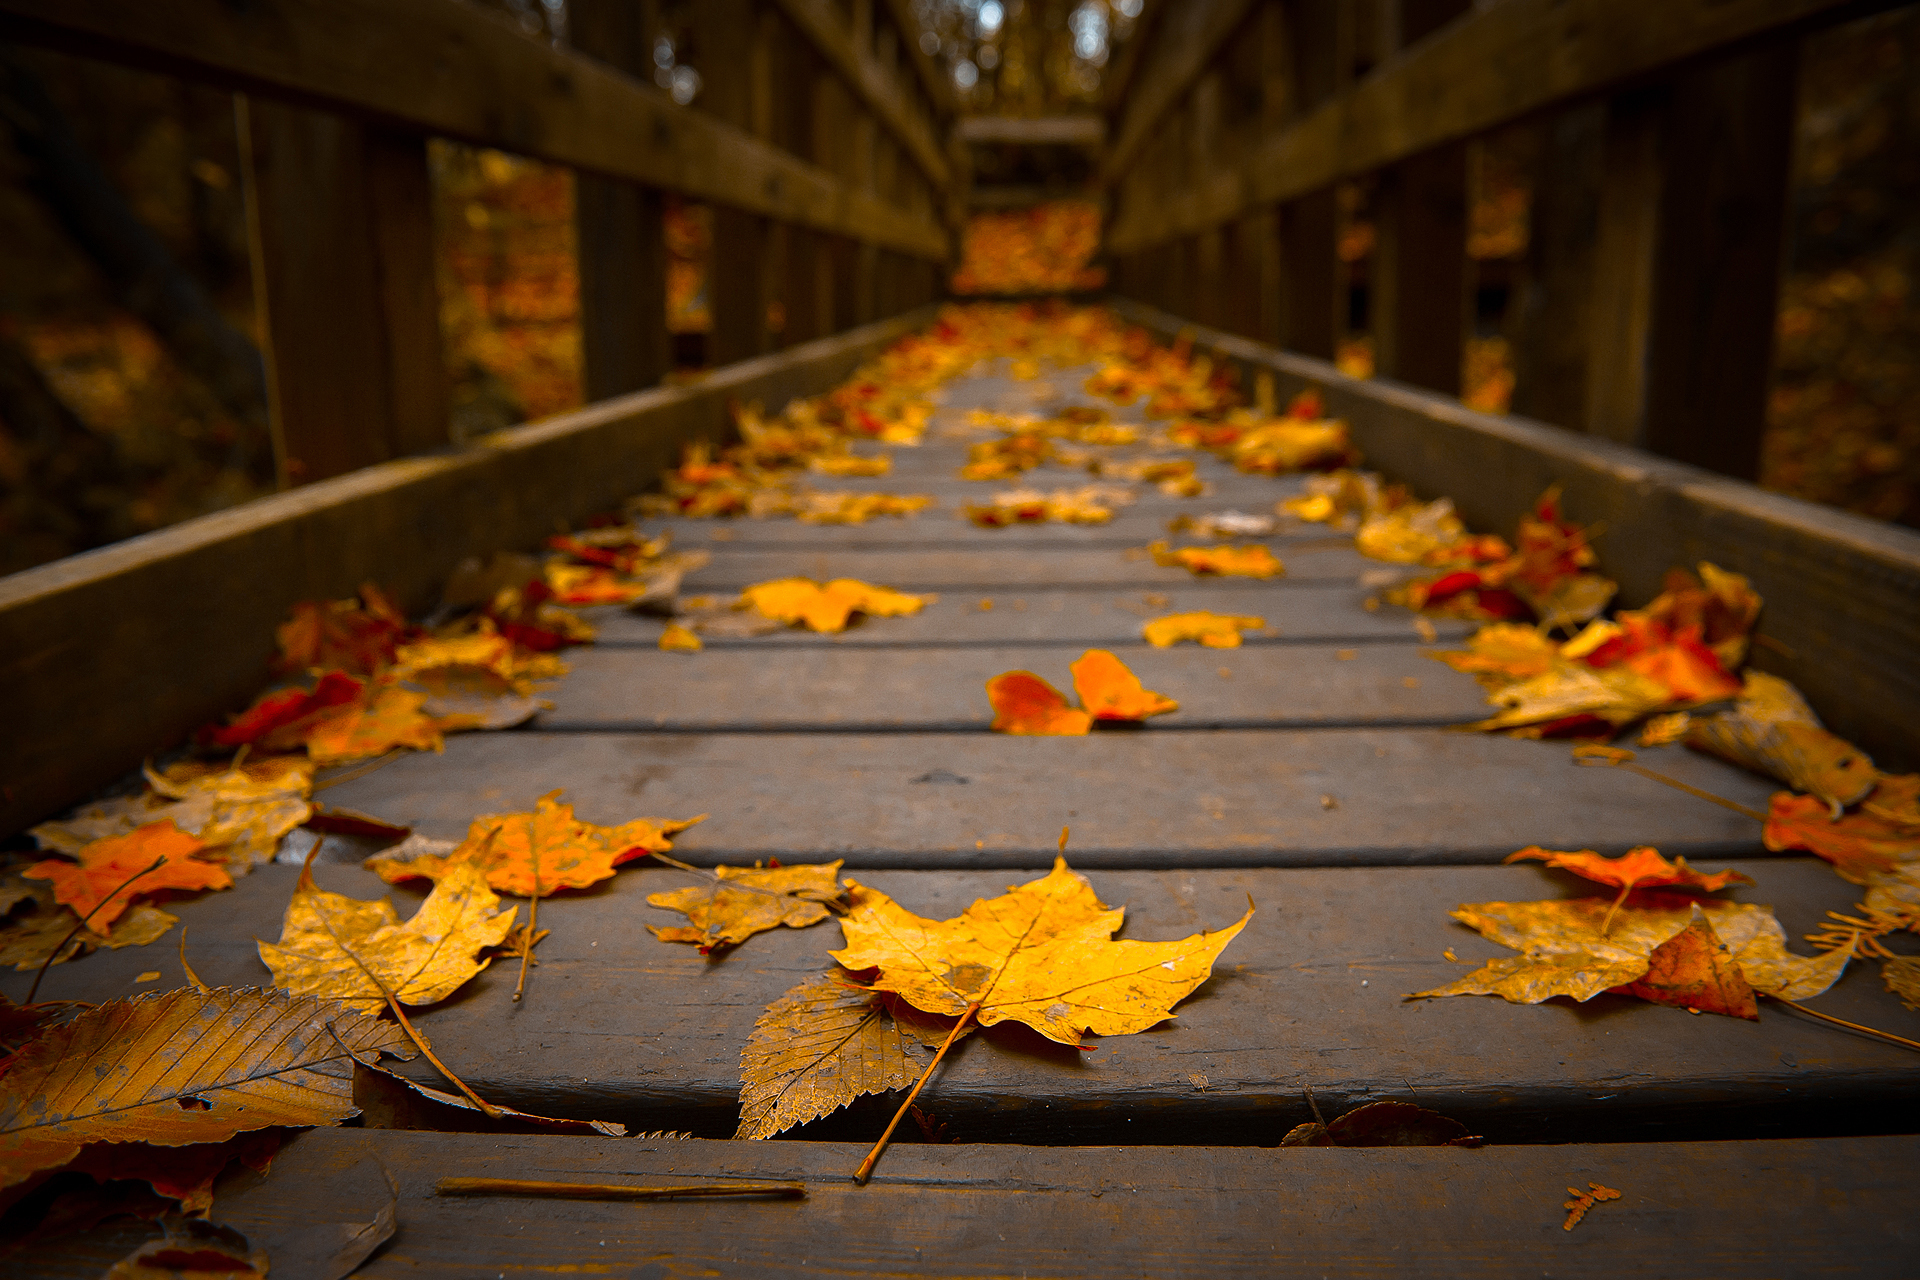 autumn wallpaper HD download.